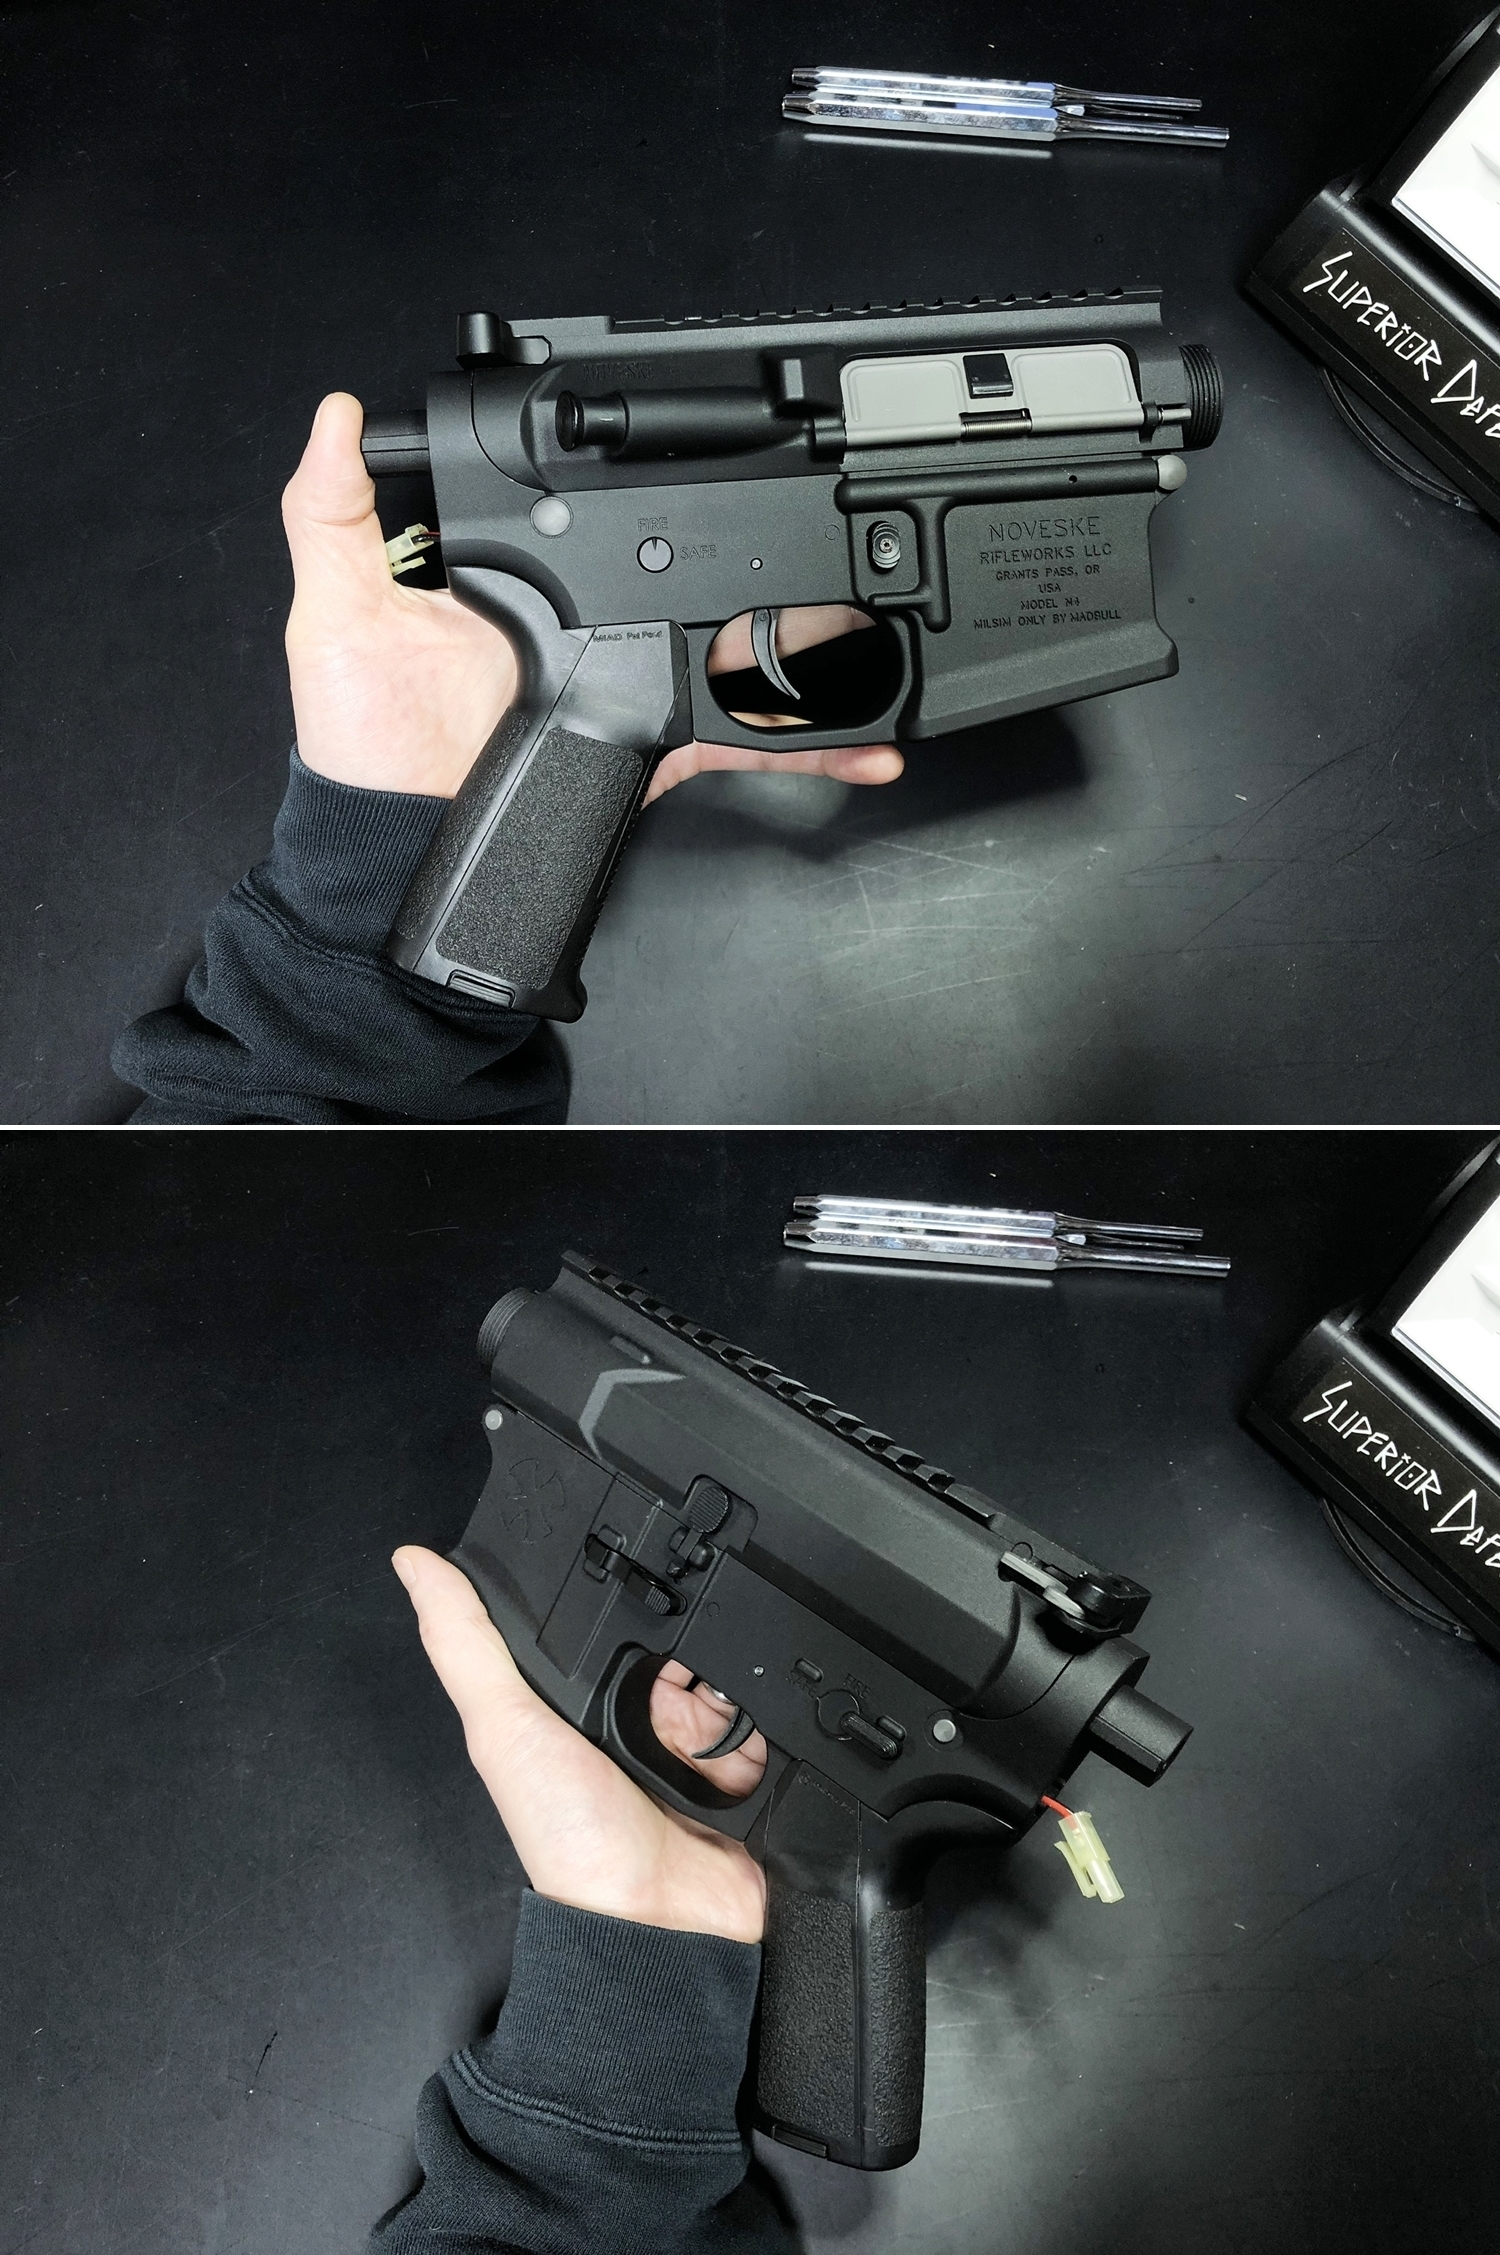 24 NOVESKE GEN3 N4 BY MADBULL!! 『第一弾』 新たにSTD民間系ARを作り始めたいと思います!! STD AR-15 M4 スタンダード 電動ガン マルイ ノベスケ ノベスキー マットブル メタルフレーム 動作テスト 組込 取付 カス